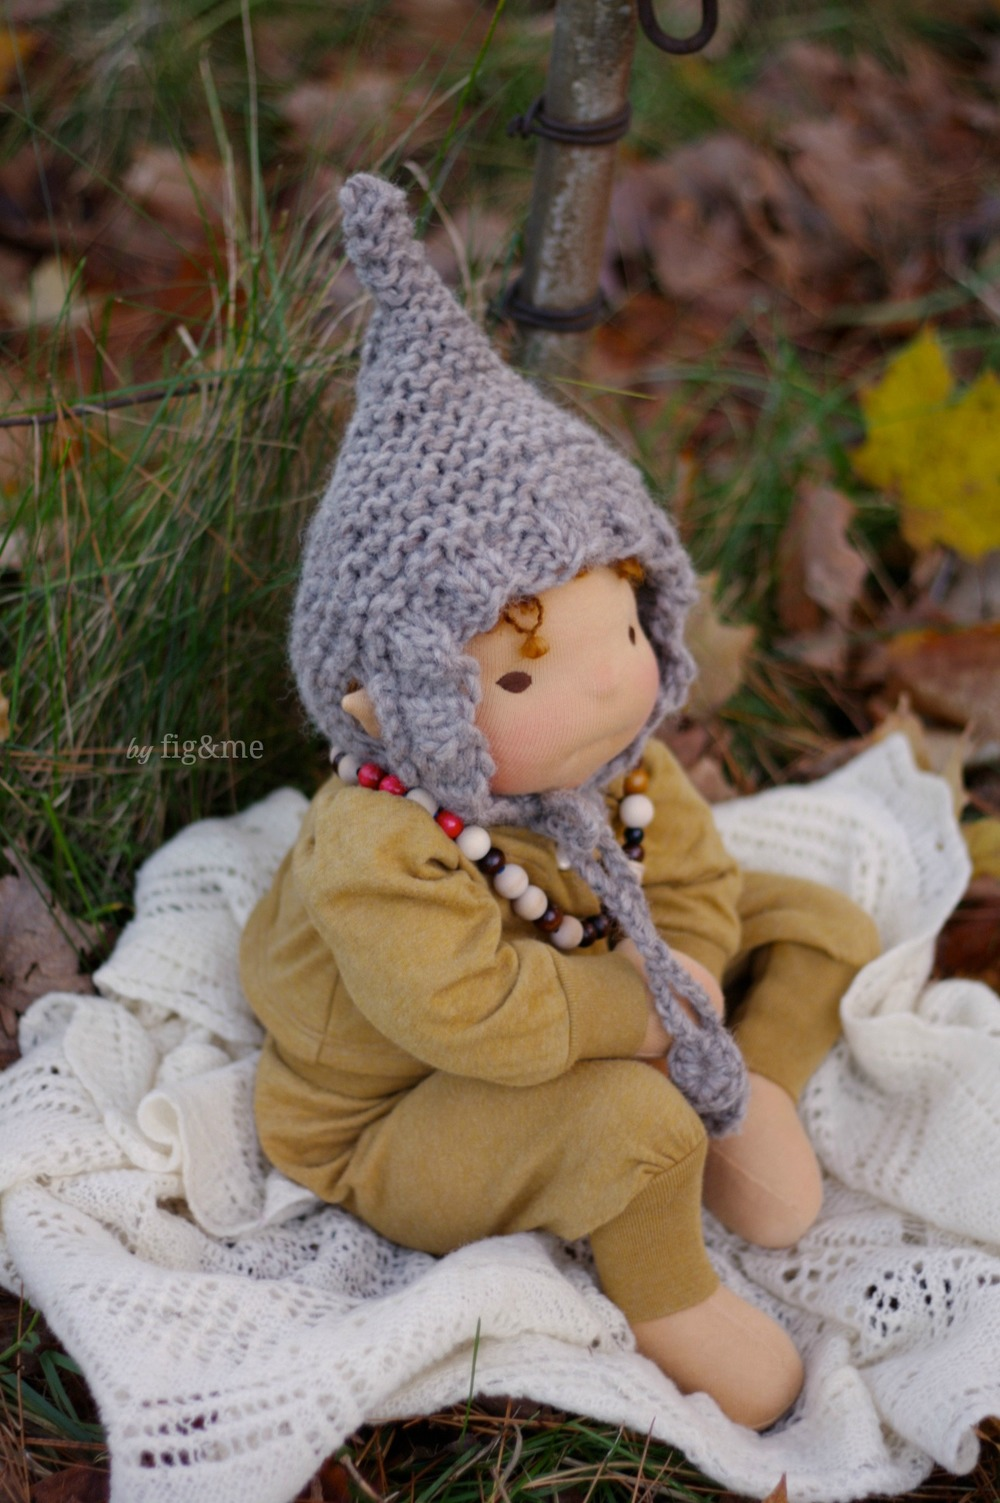 arwen-edwina-hat-figandme.jpg